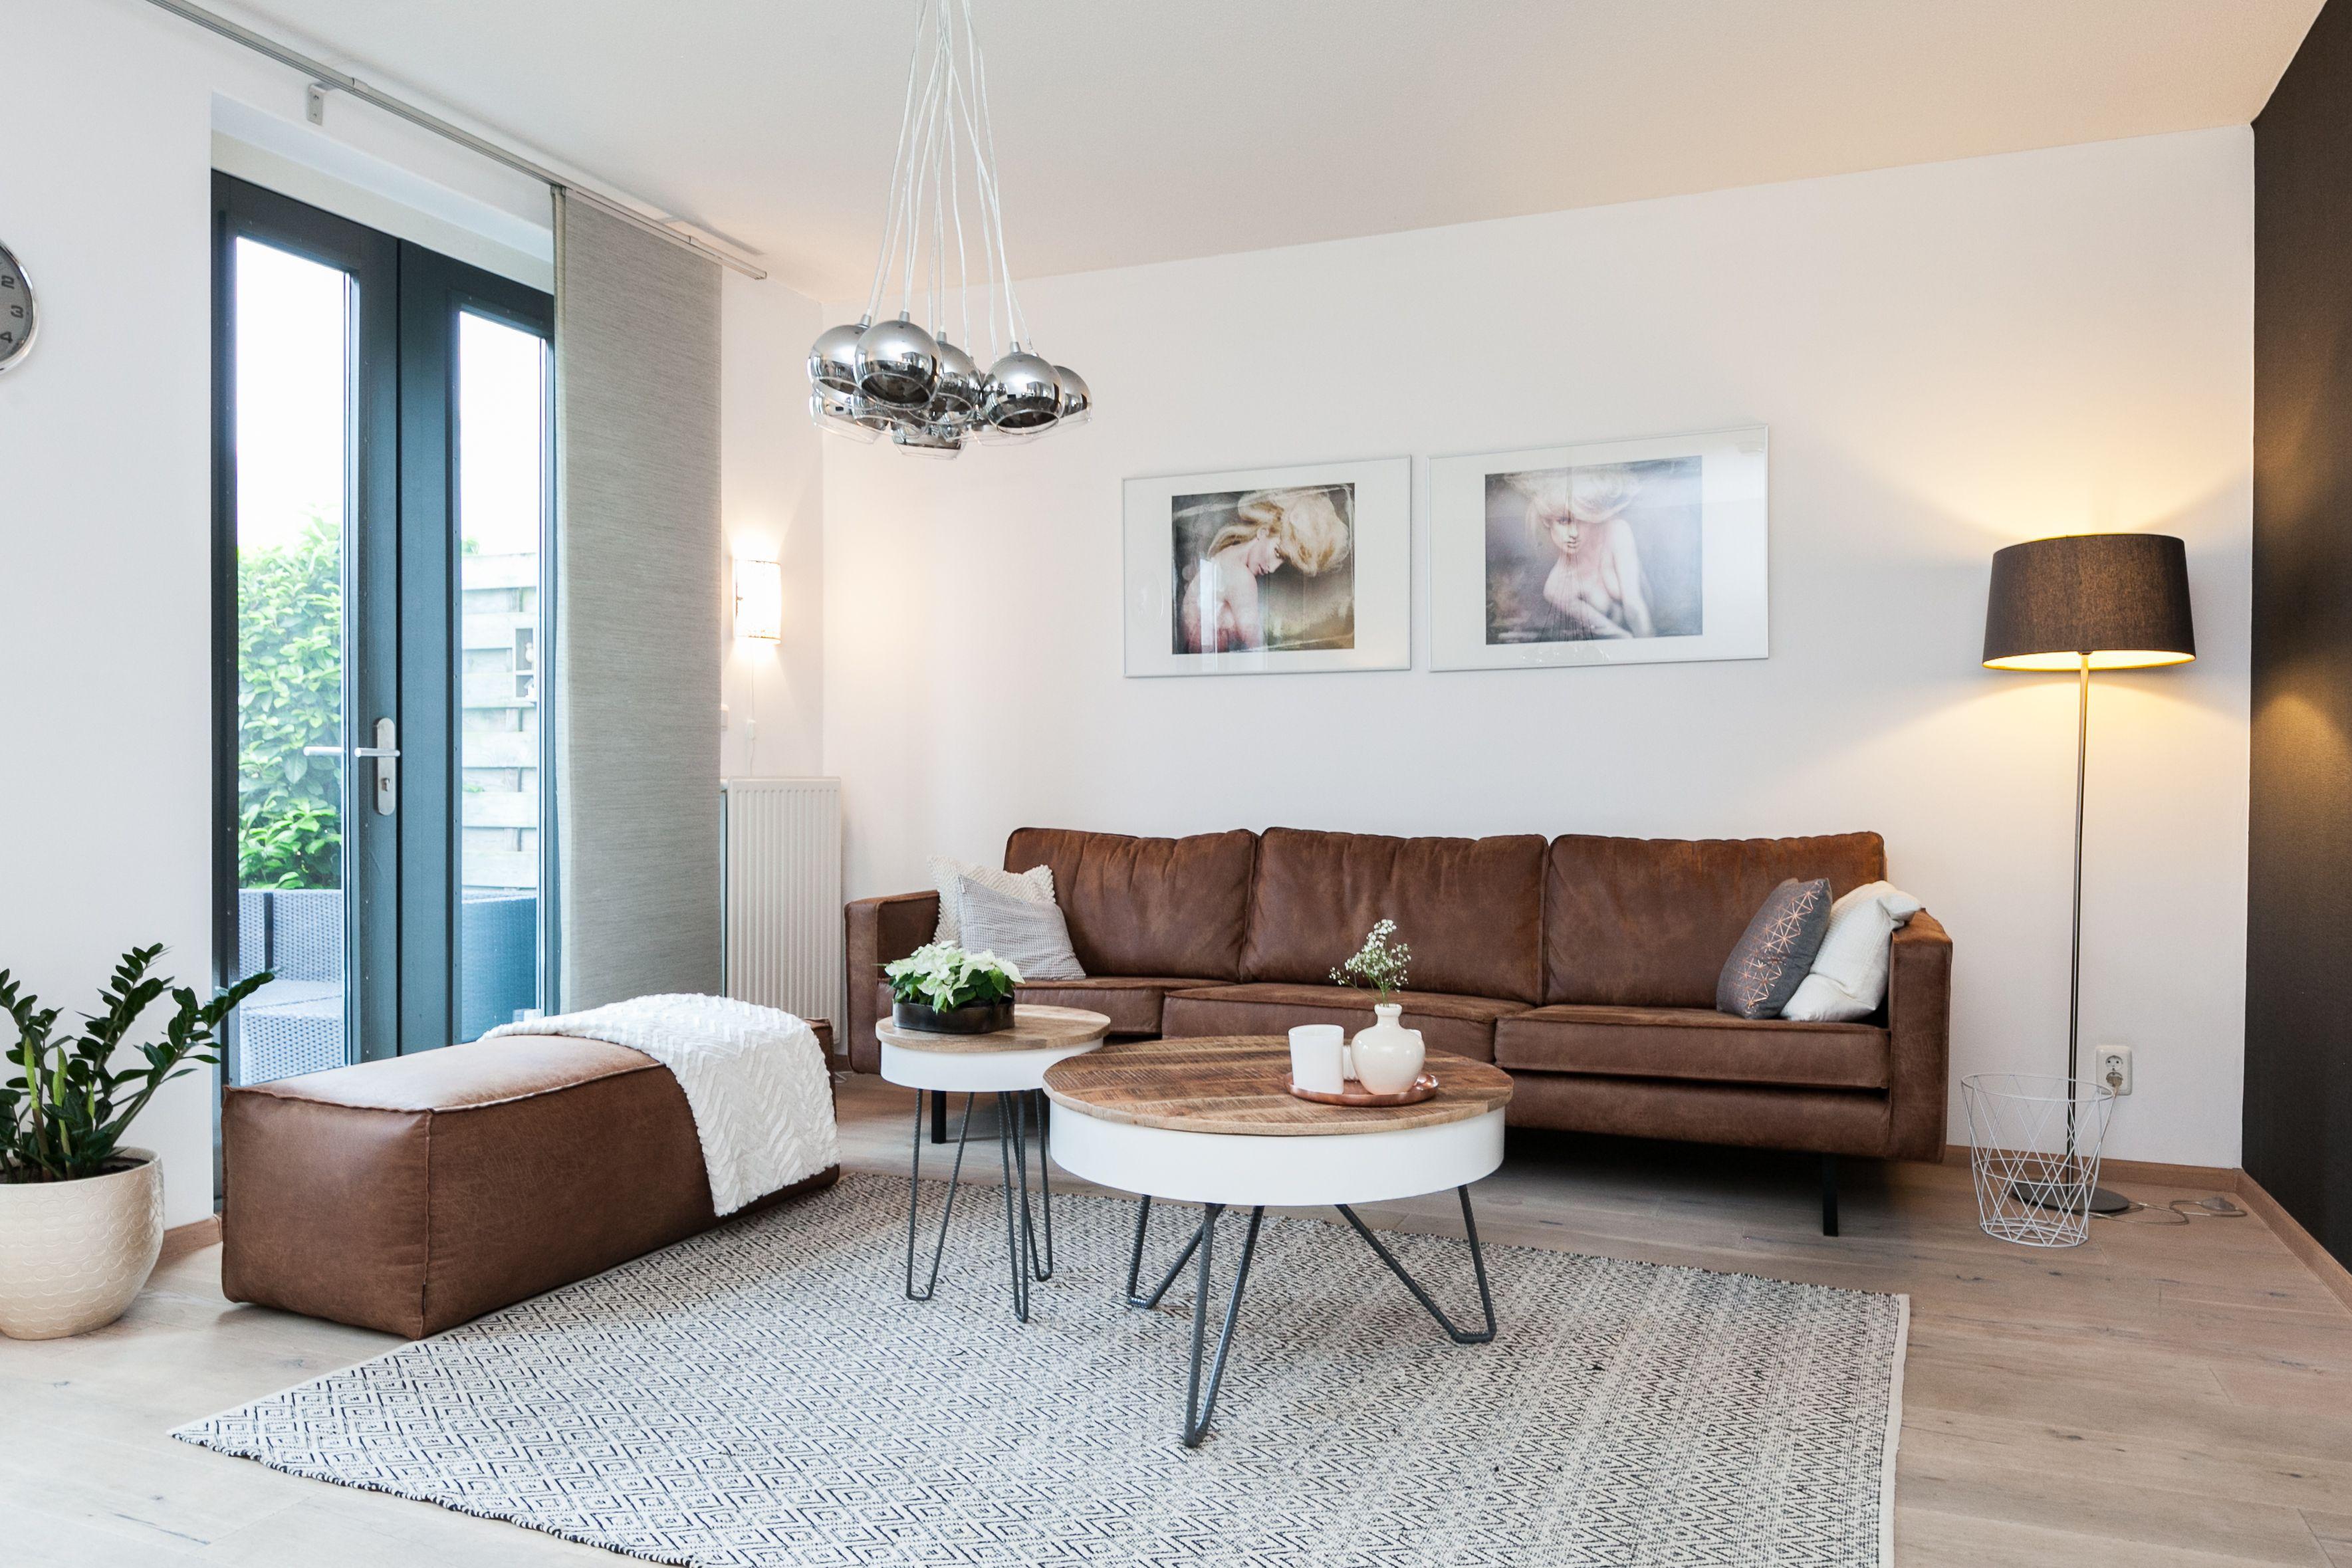 woonkamer Zwolle #interieur #styling #zien24 #livingroom ...